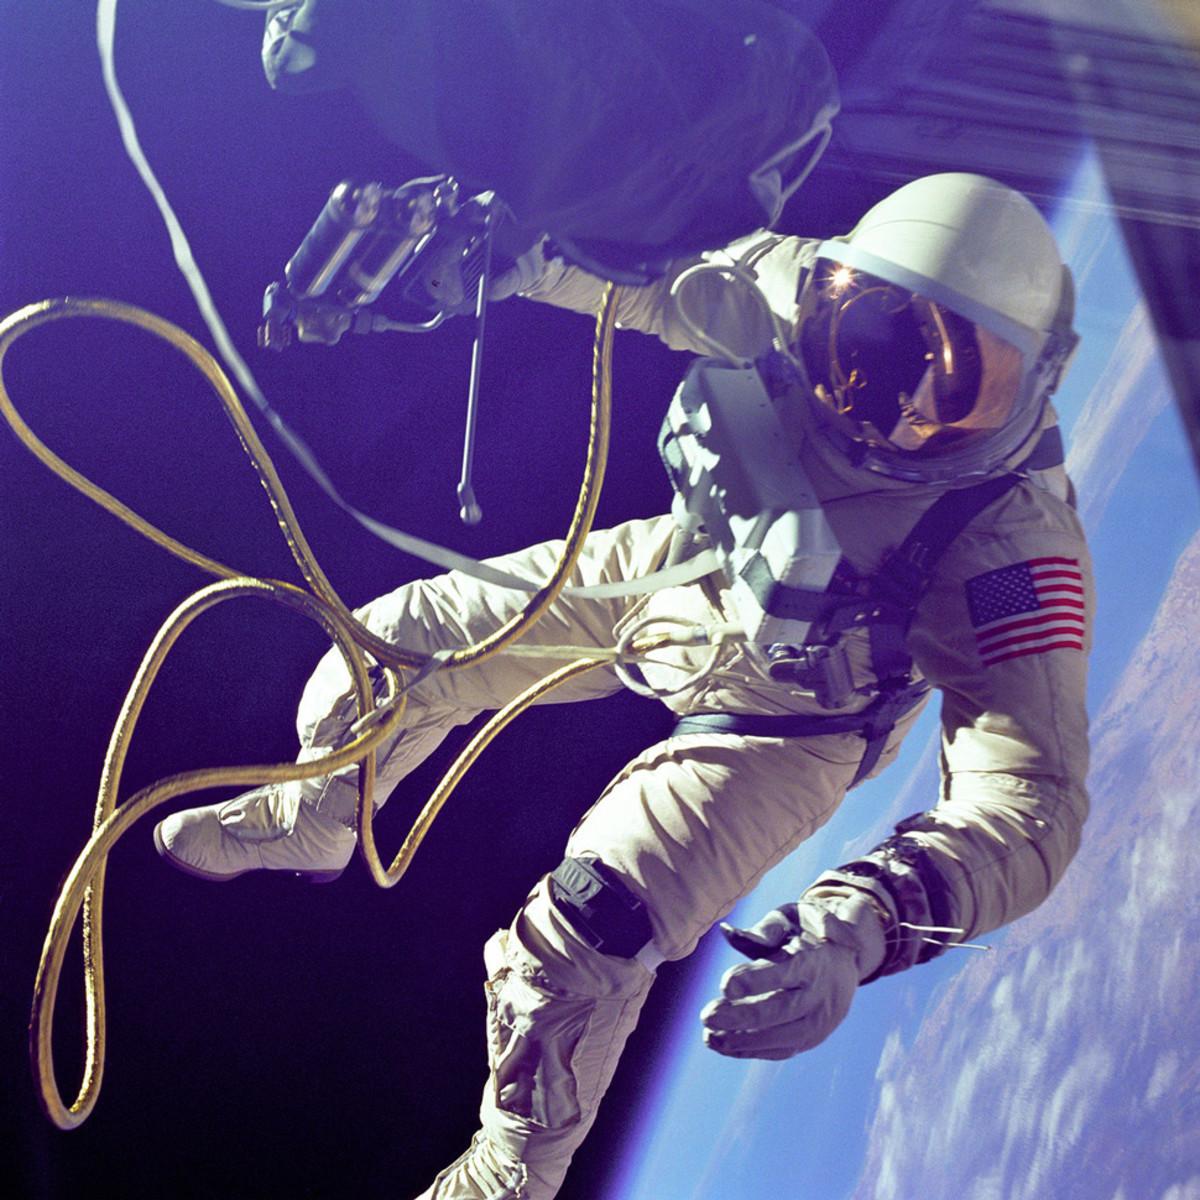 Gemini-4-Ed-White-Gear-Patrol-